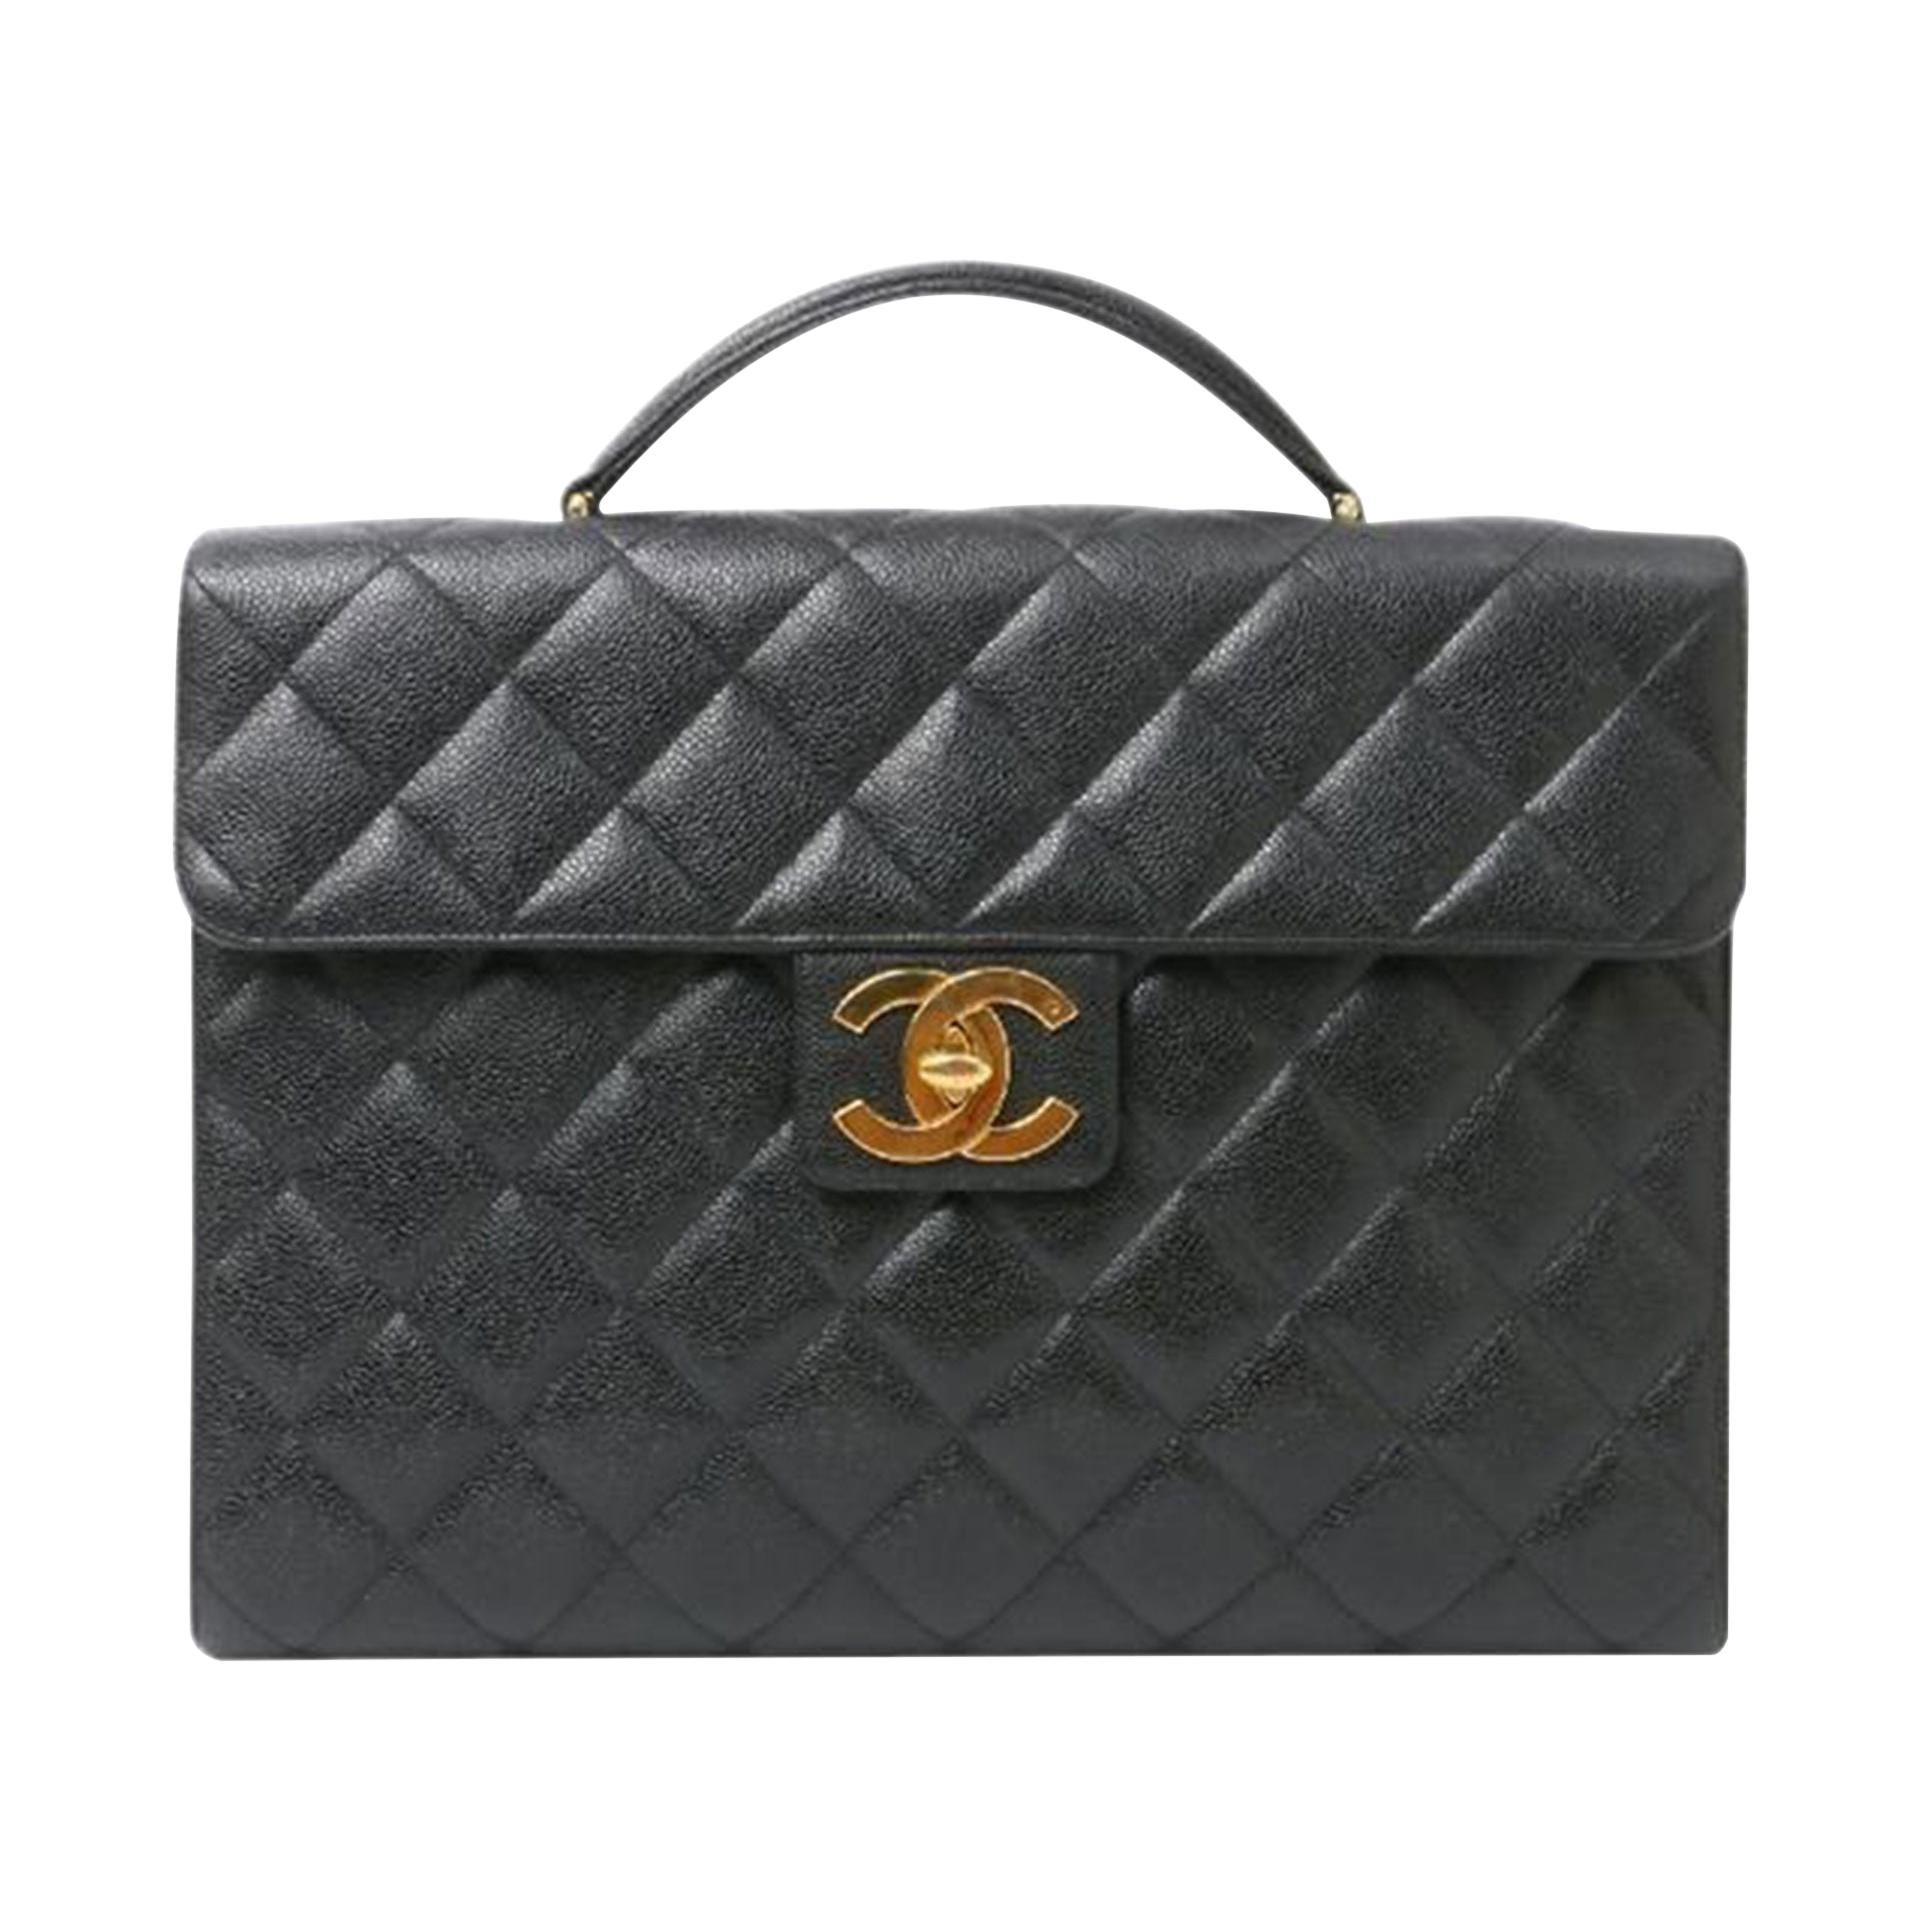 Chanel Classic Flap Portfolio Caviar Briefcase Black Leather Laptop Bag